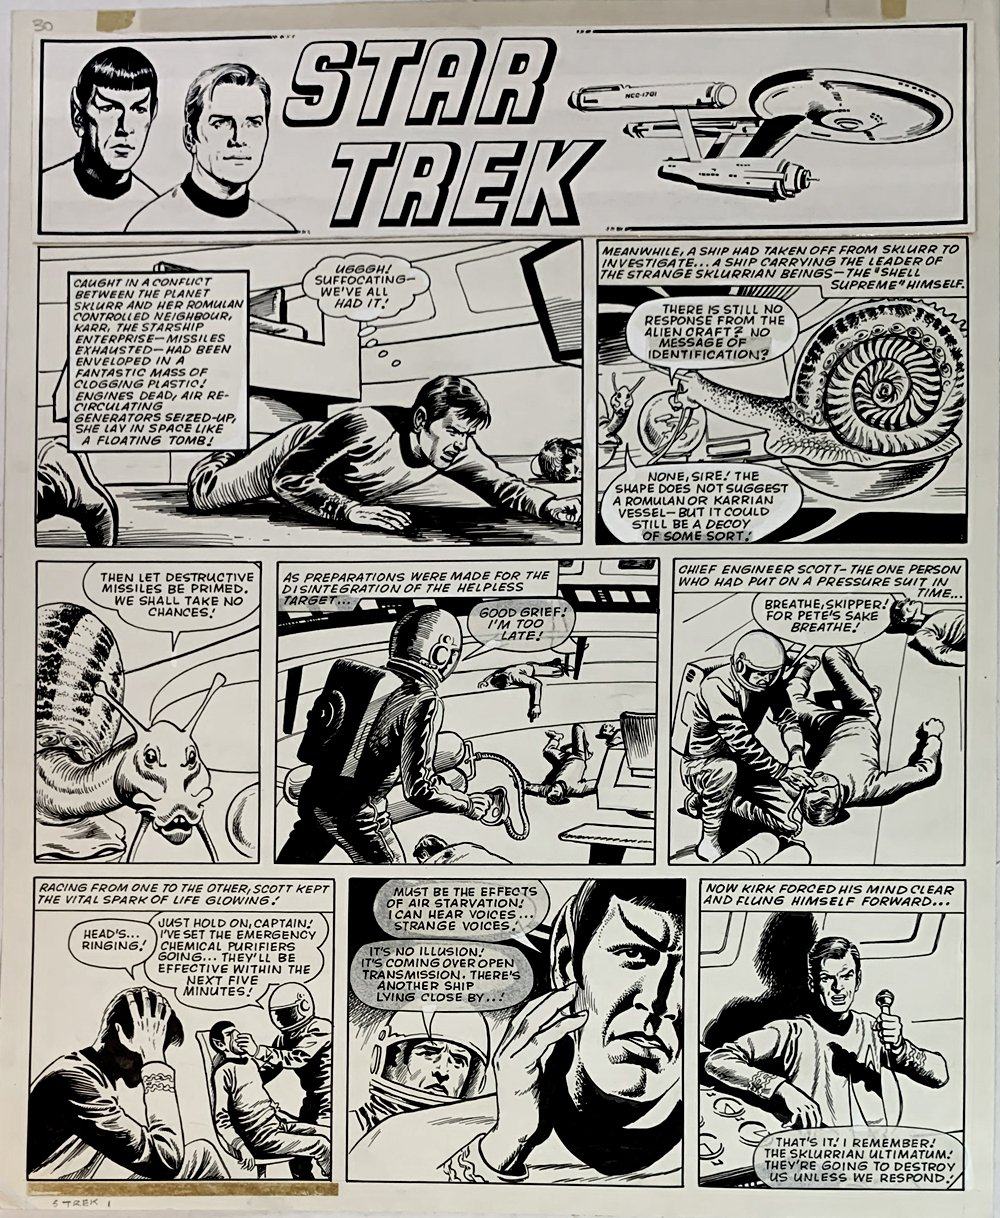 Star Trek Newspaper Strip 7-14-1973 (VERY LARGE)